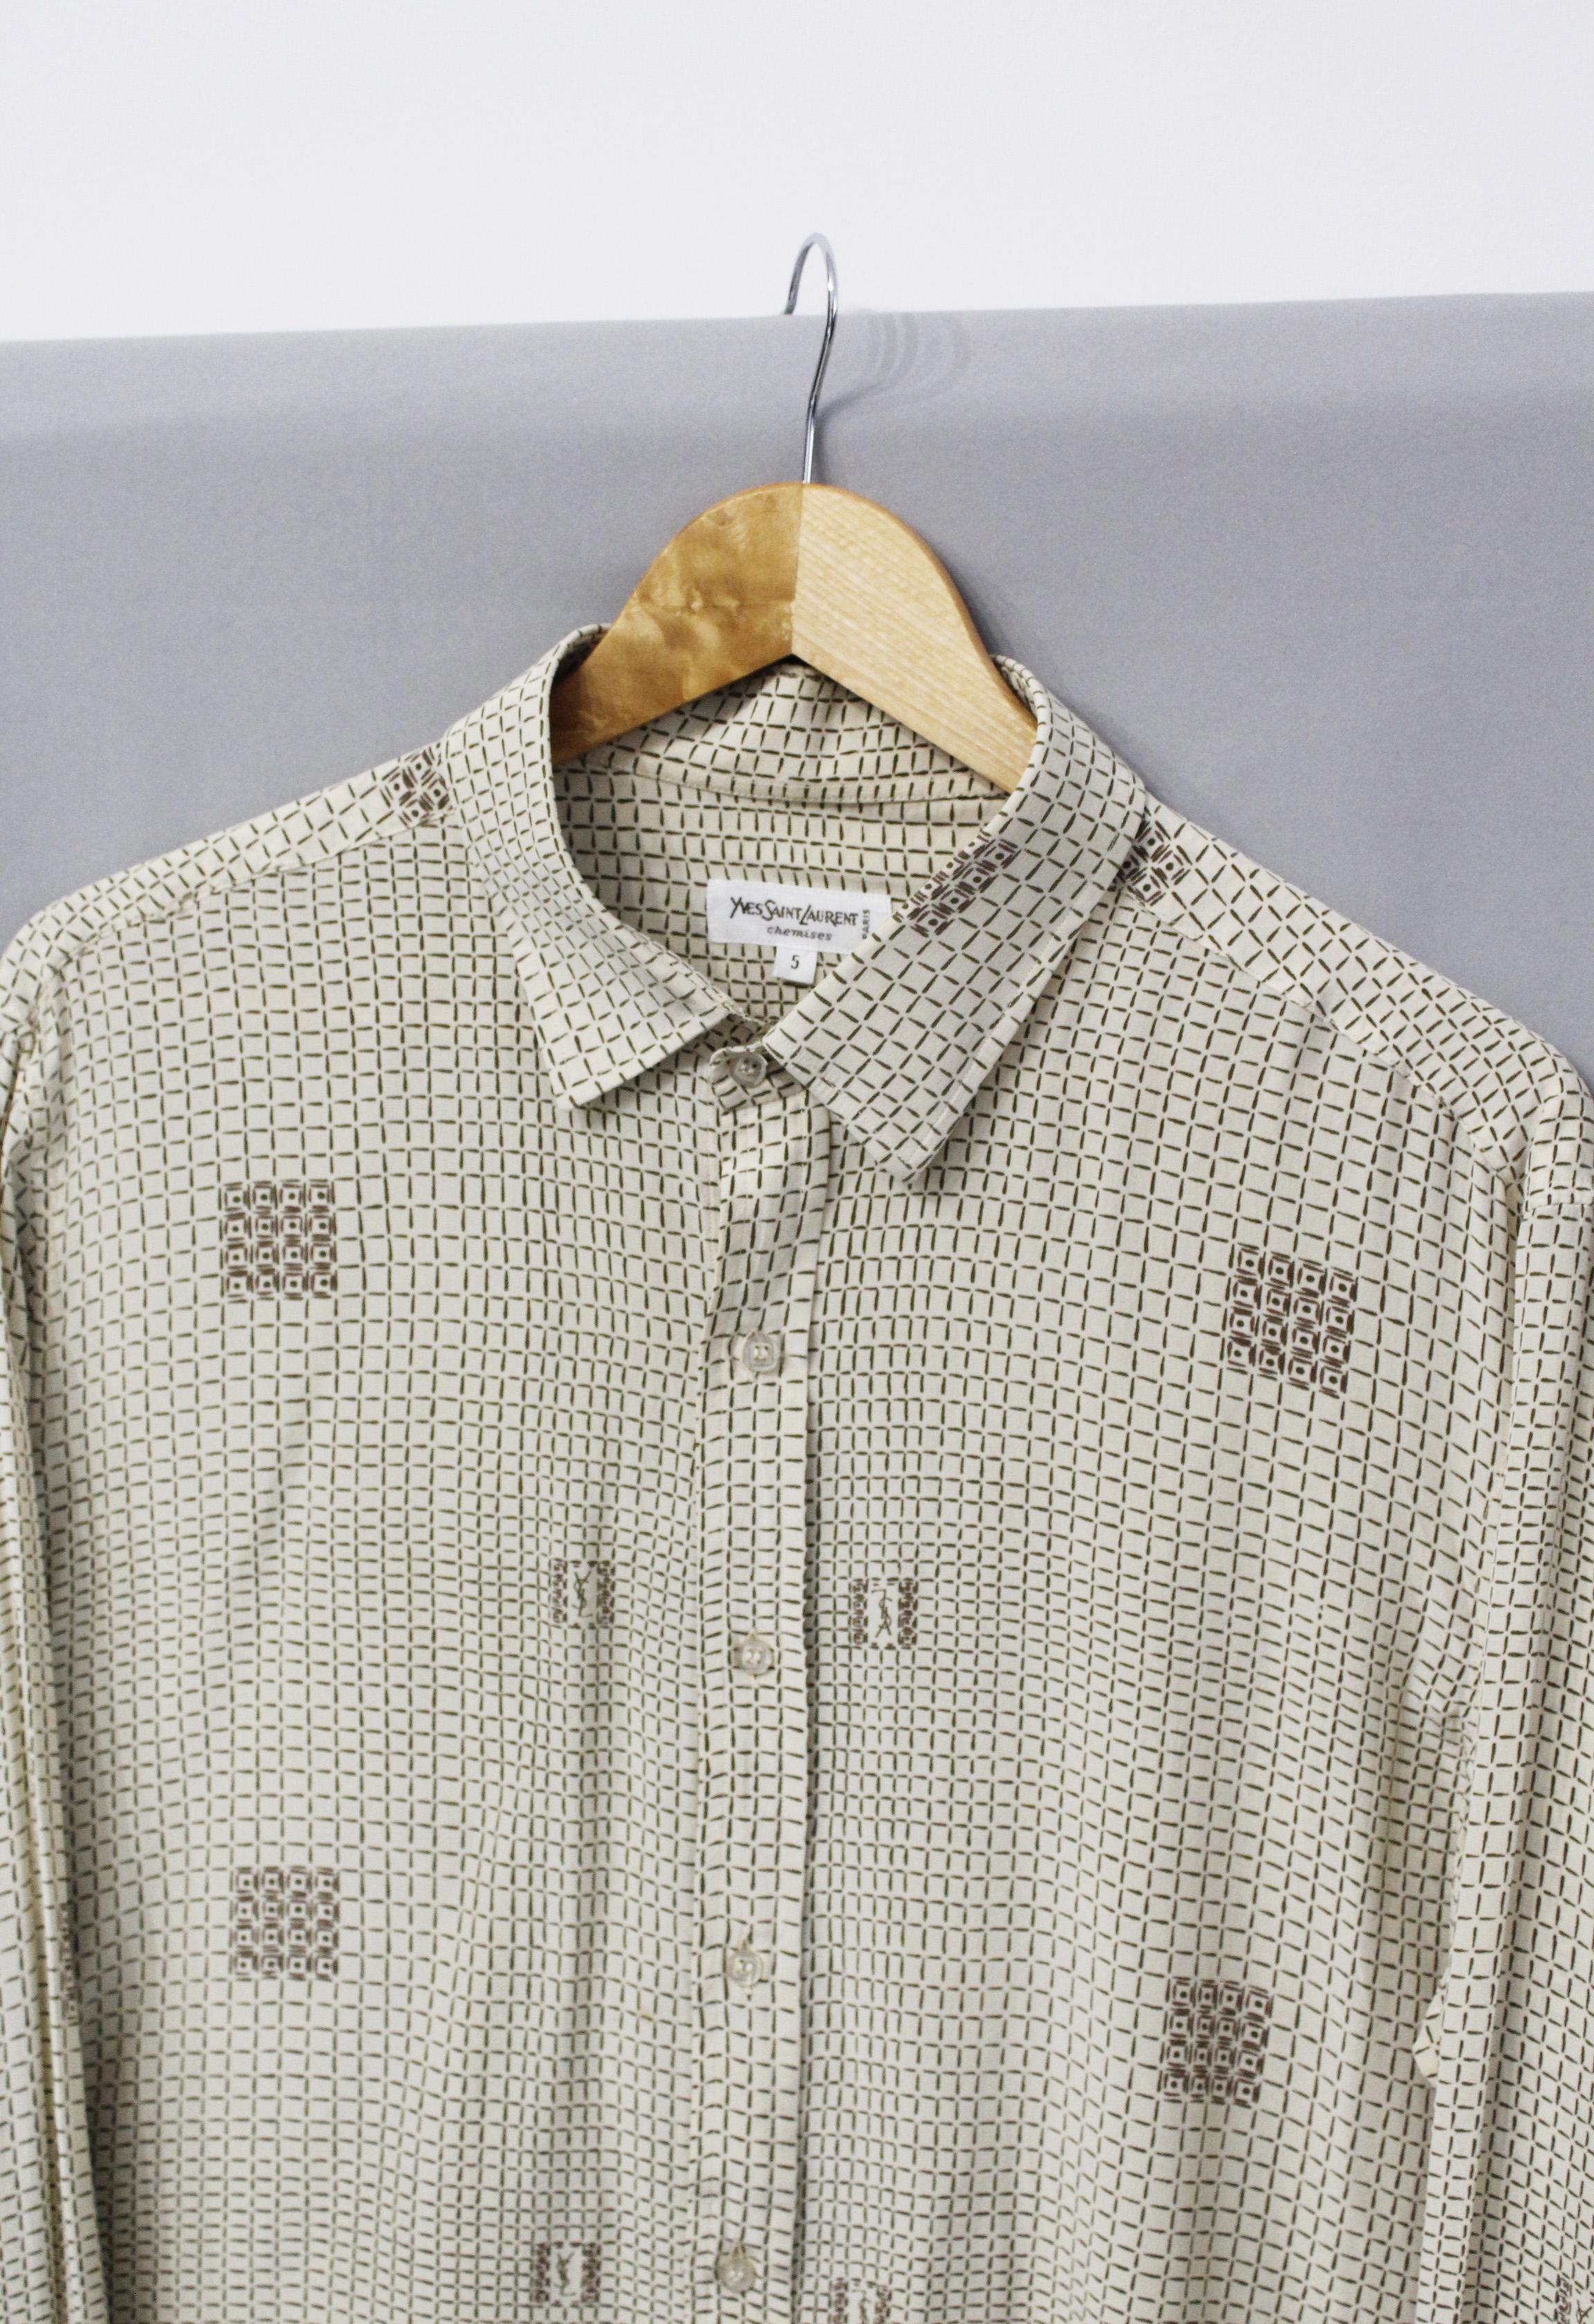 Vintage Yves Saint Laurent Chemises Check Monogram Logo YSL silk shirt